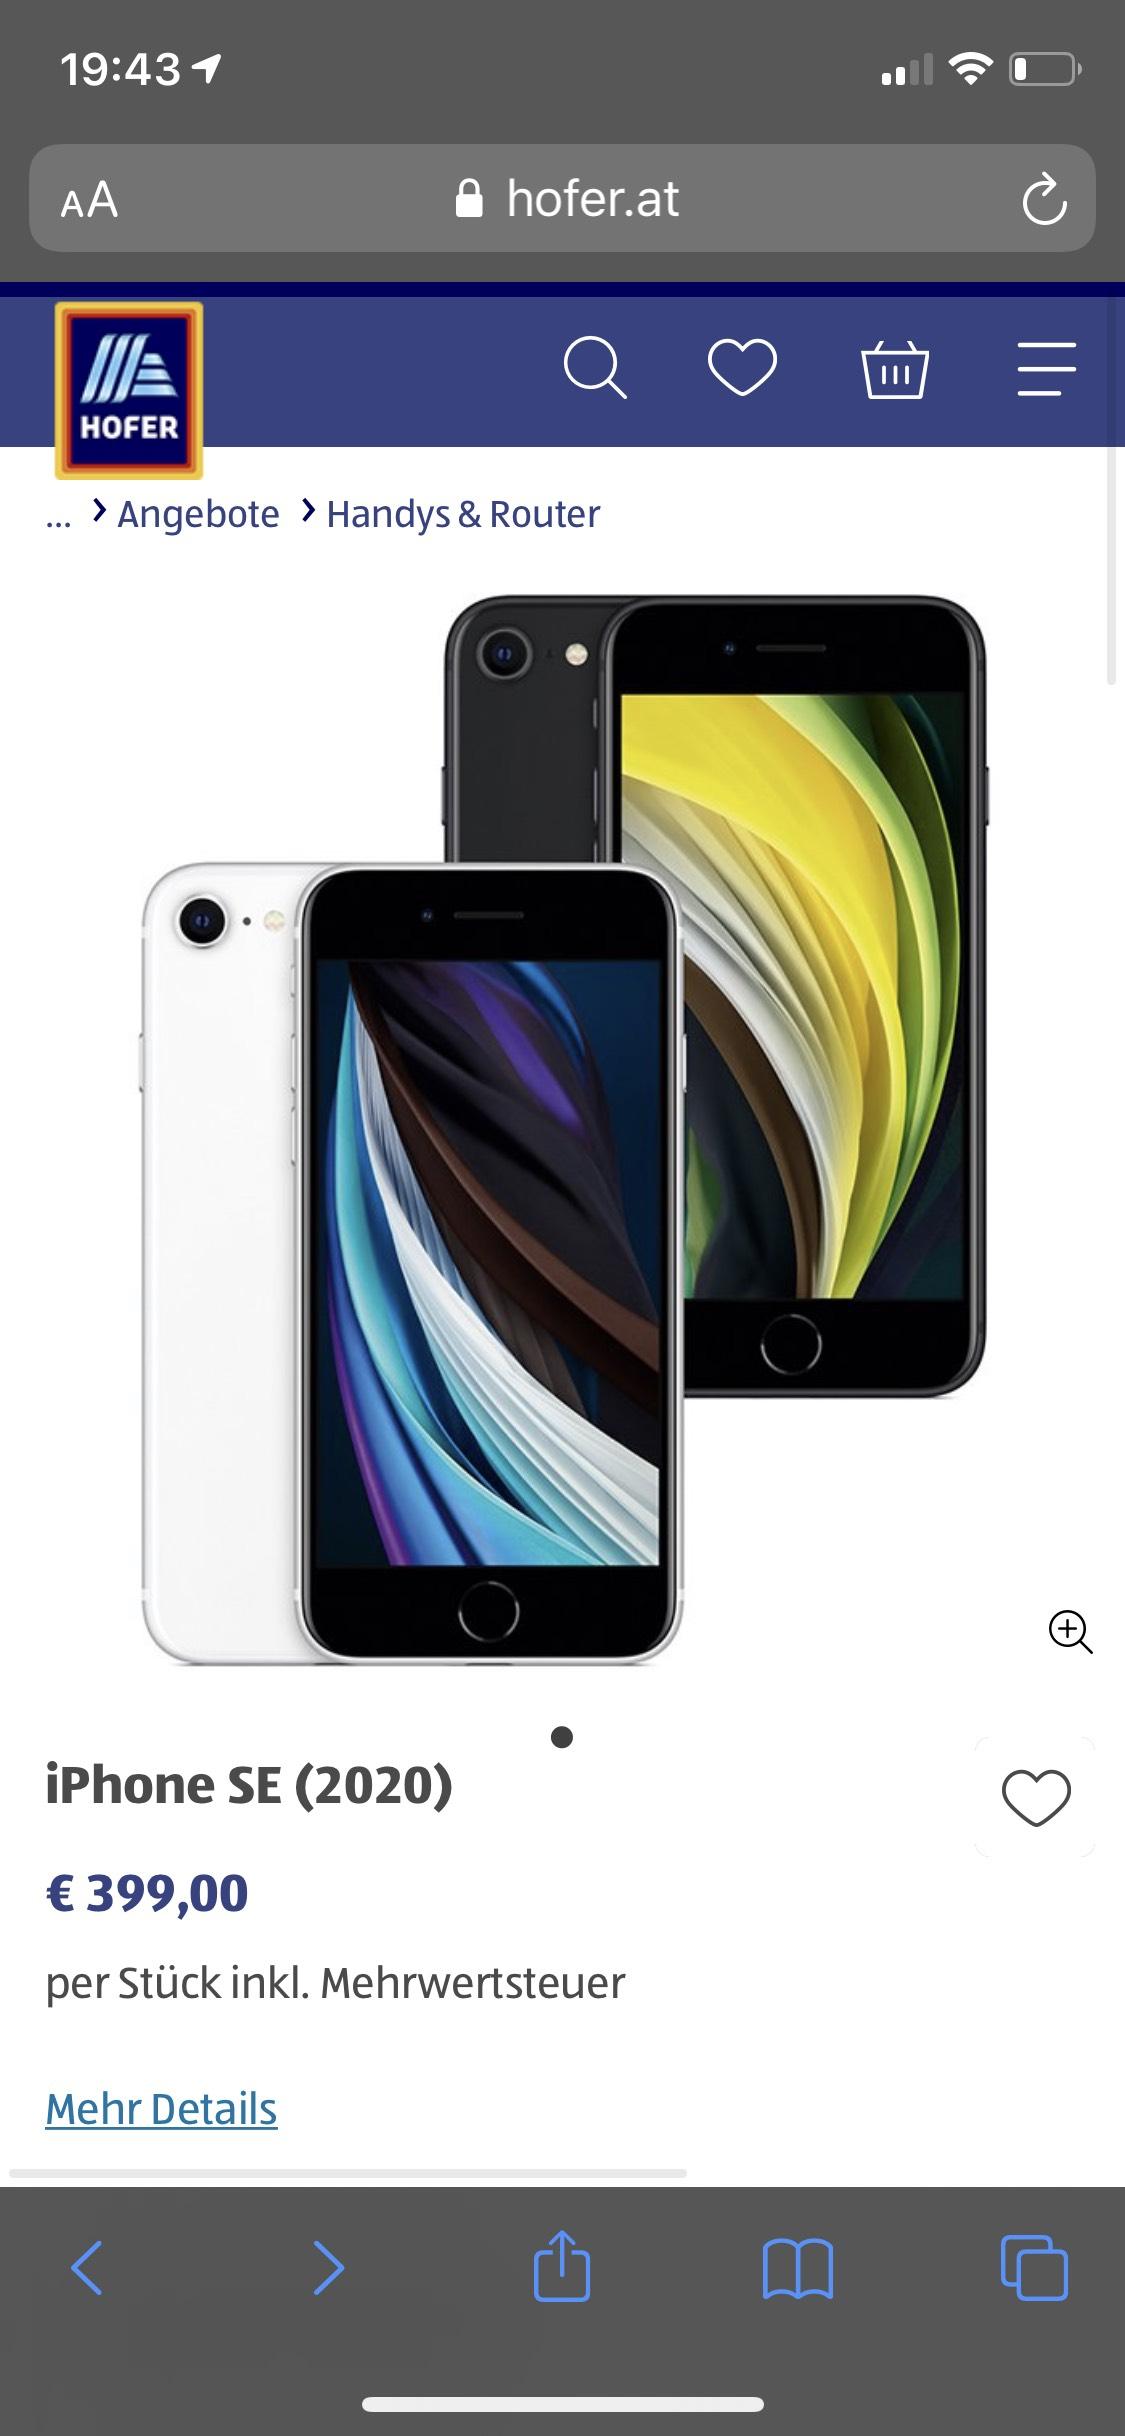 iPhone SE 2020 (64GB) bei Hofer